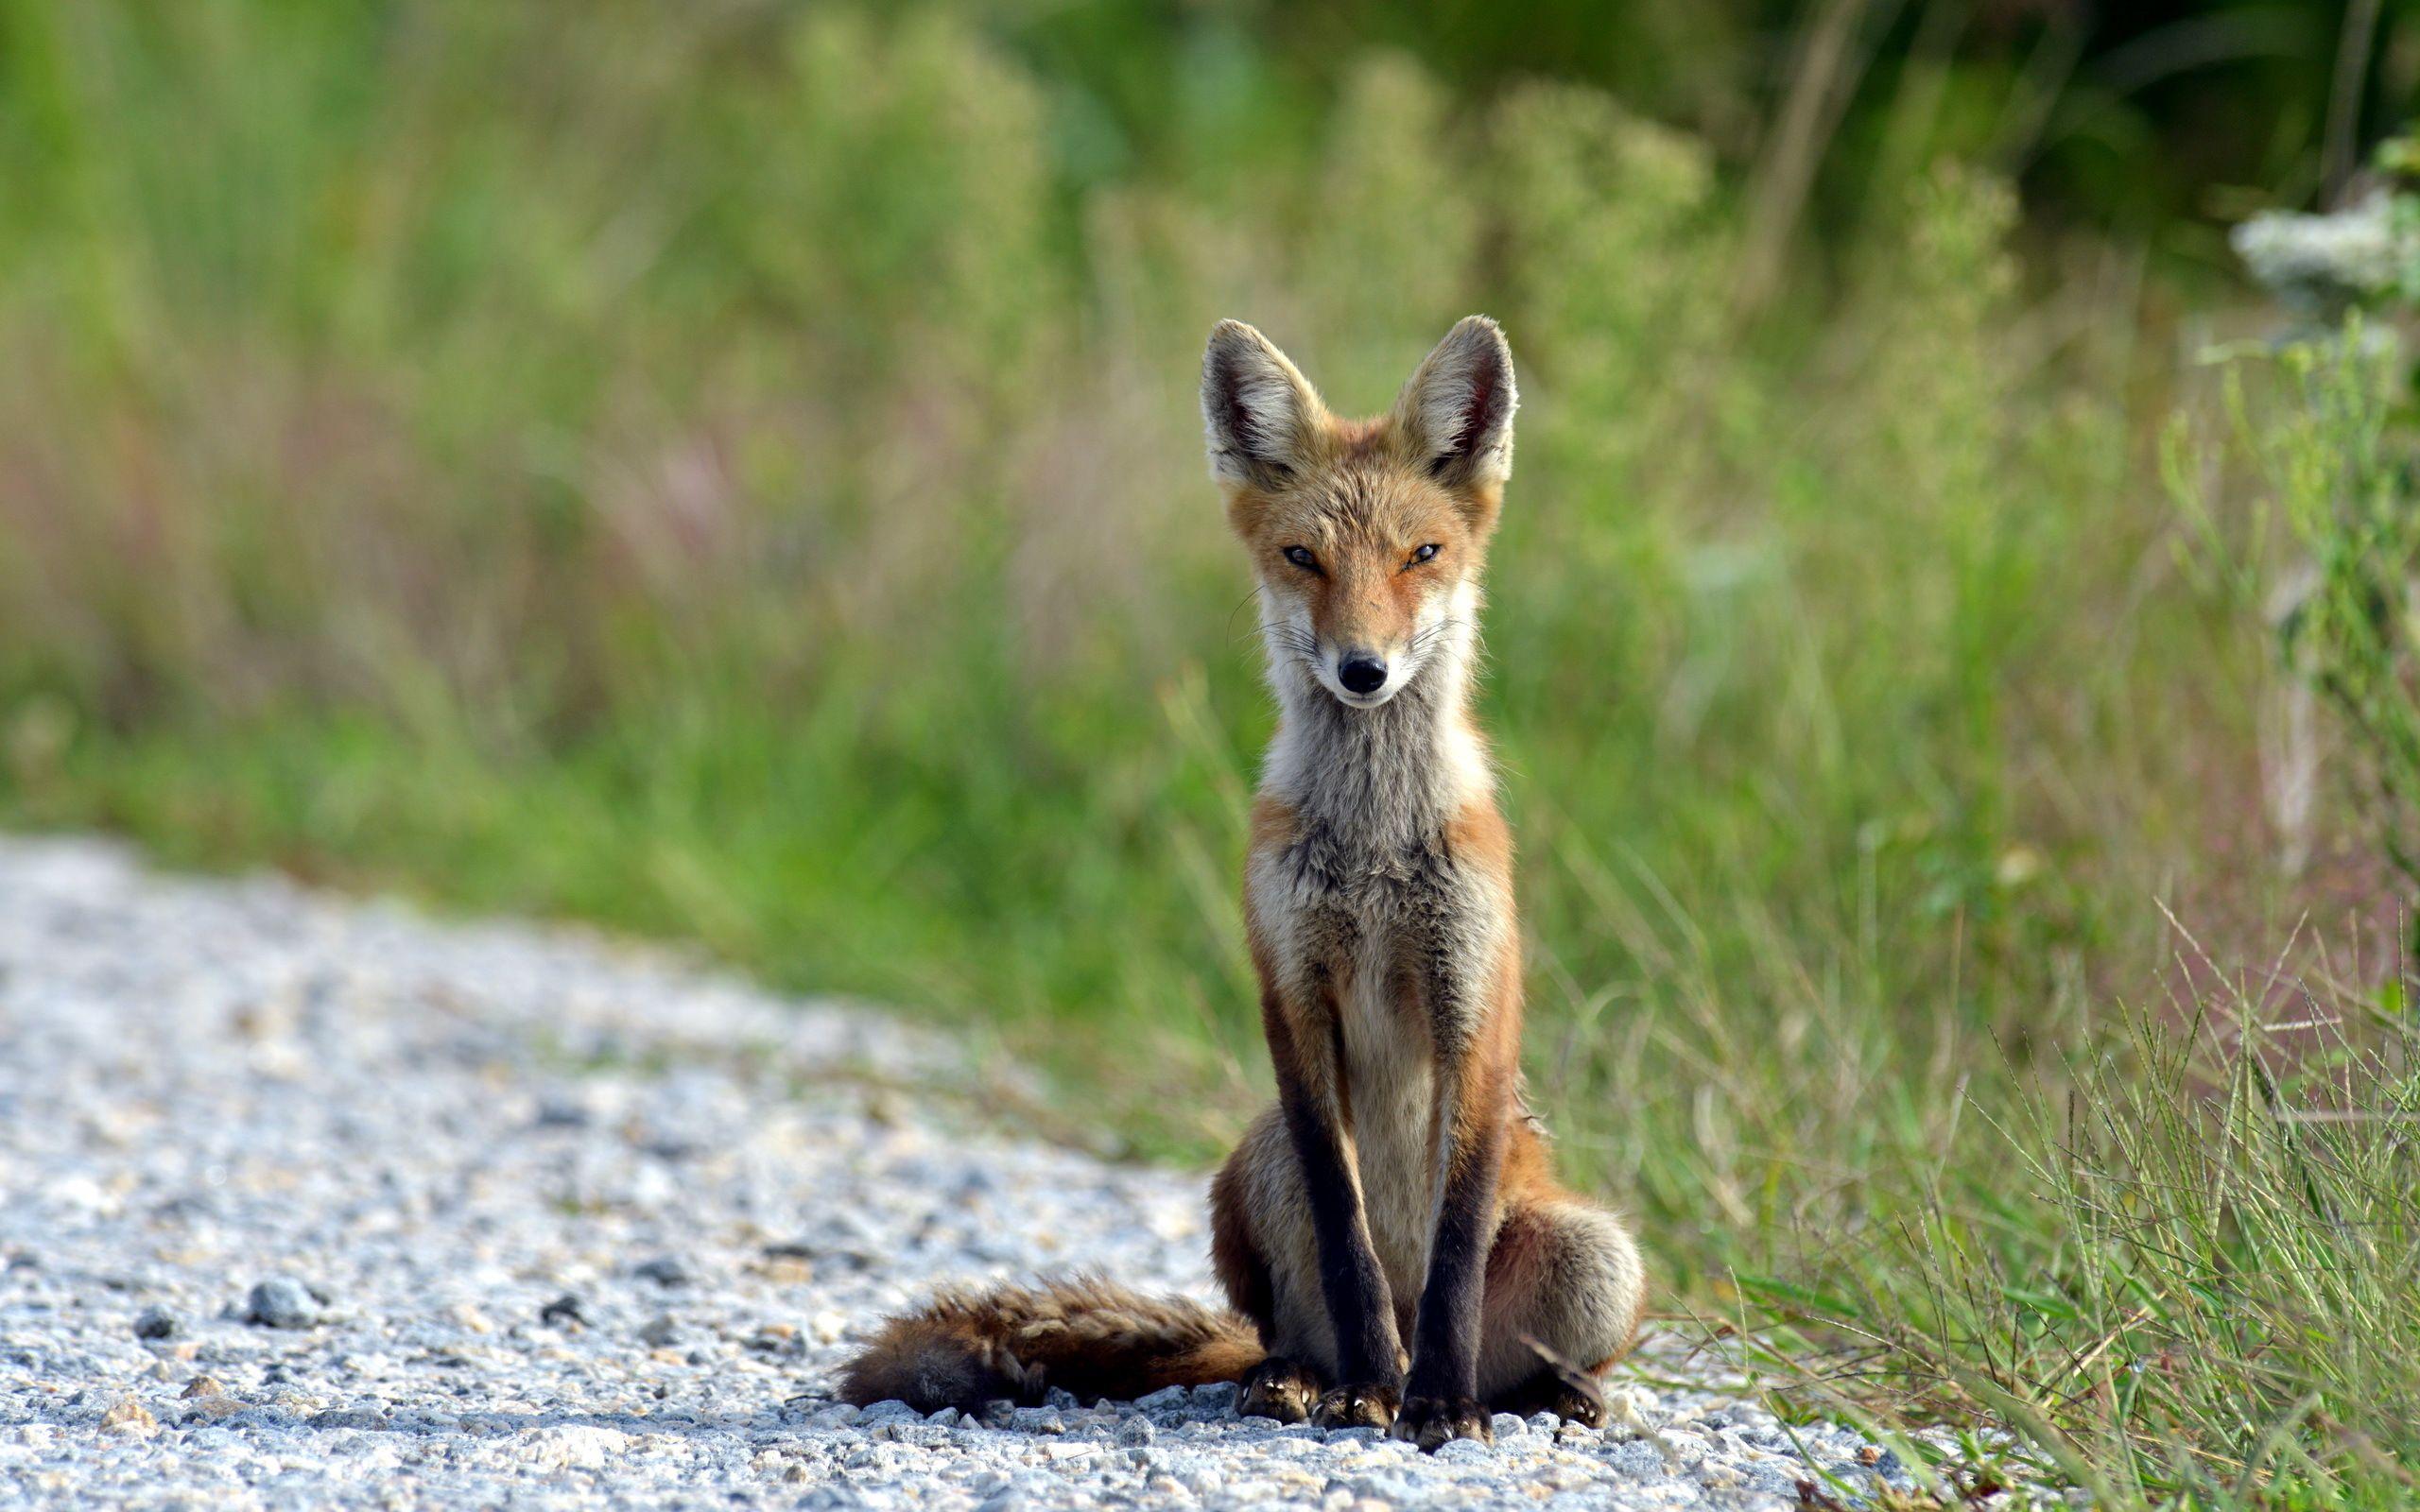 'Thin Fox' from 21/10/15 Animal